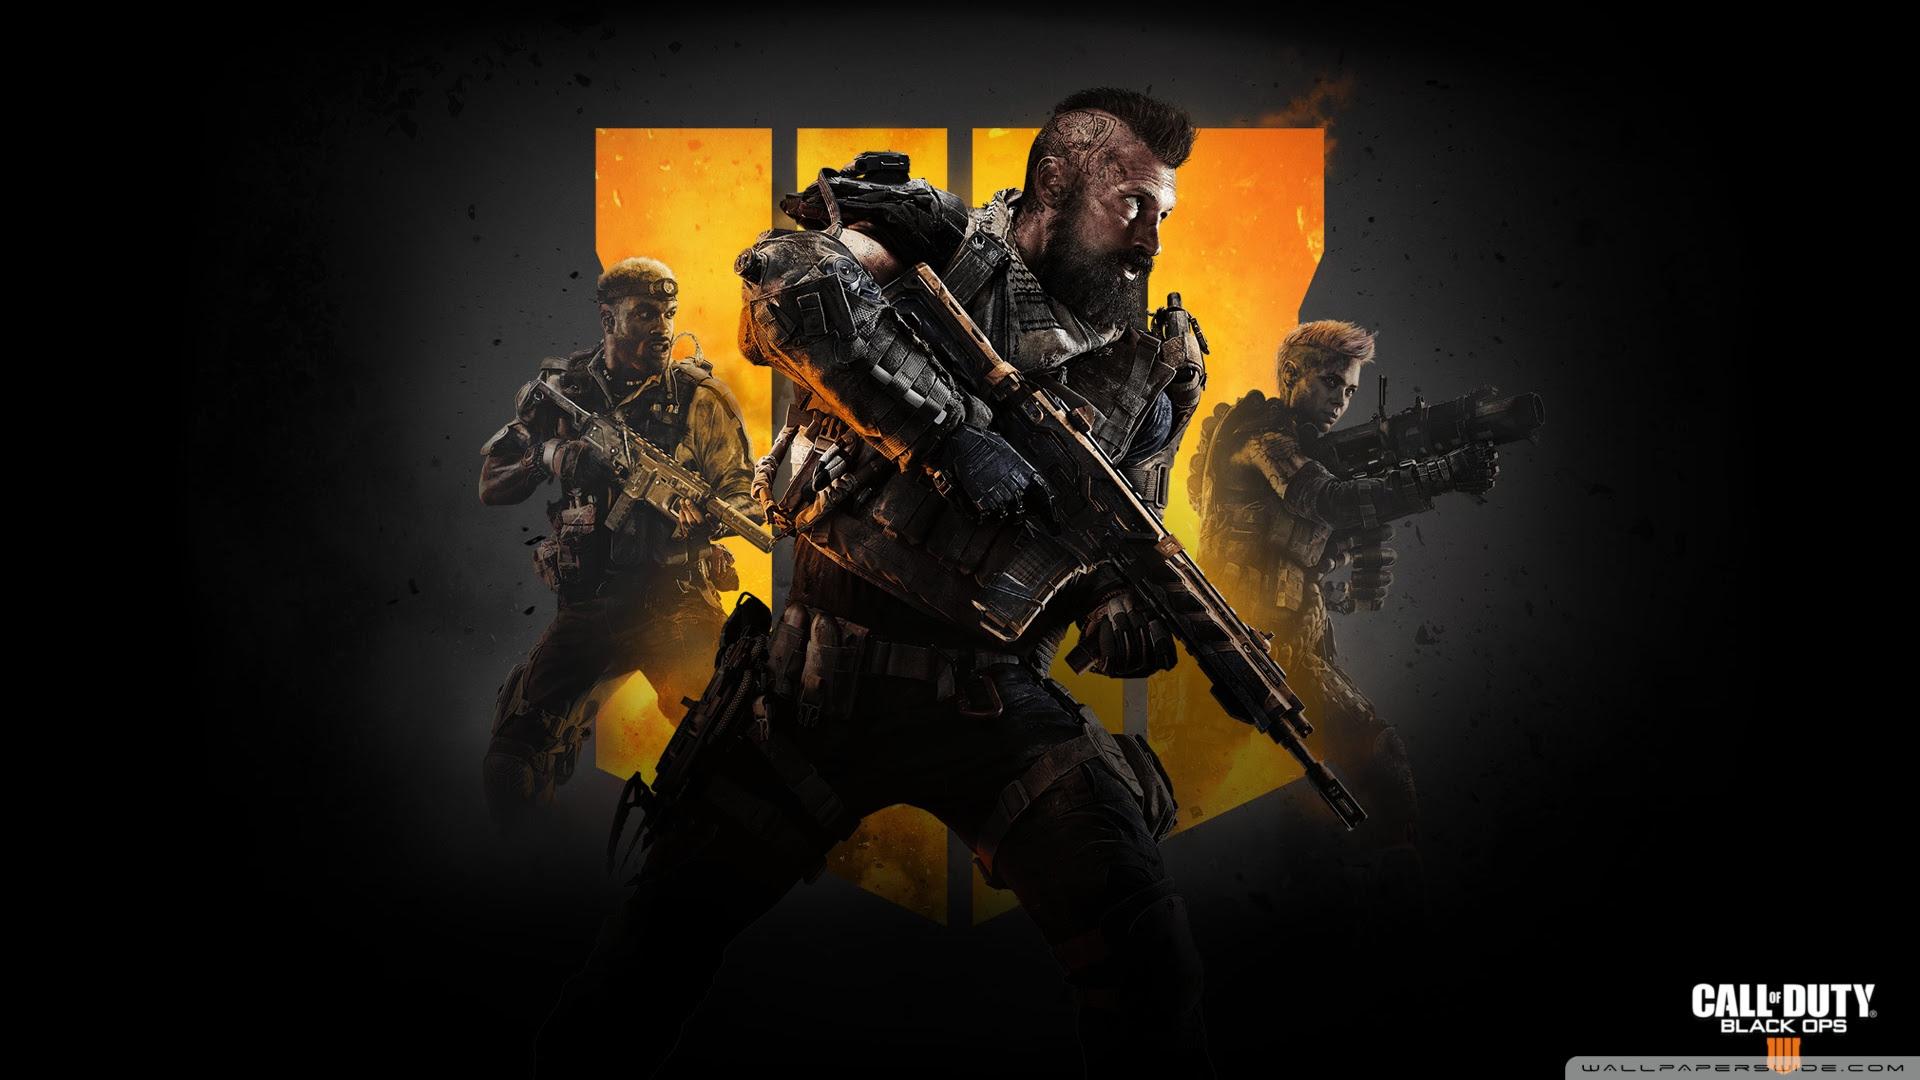 Call Of Duty Black Ops 4 Ultra Hd Desktop Background Wallpaper For